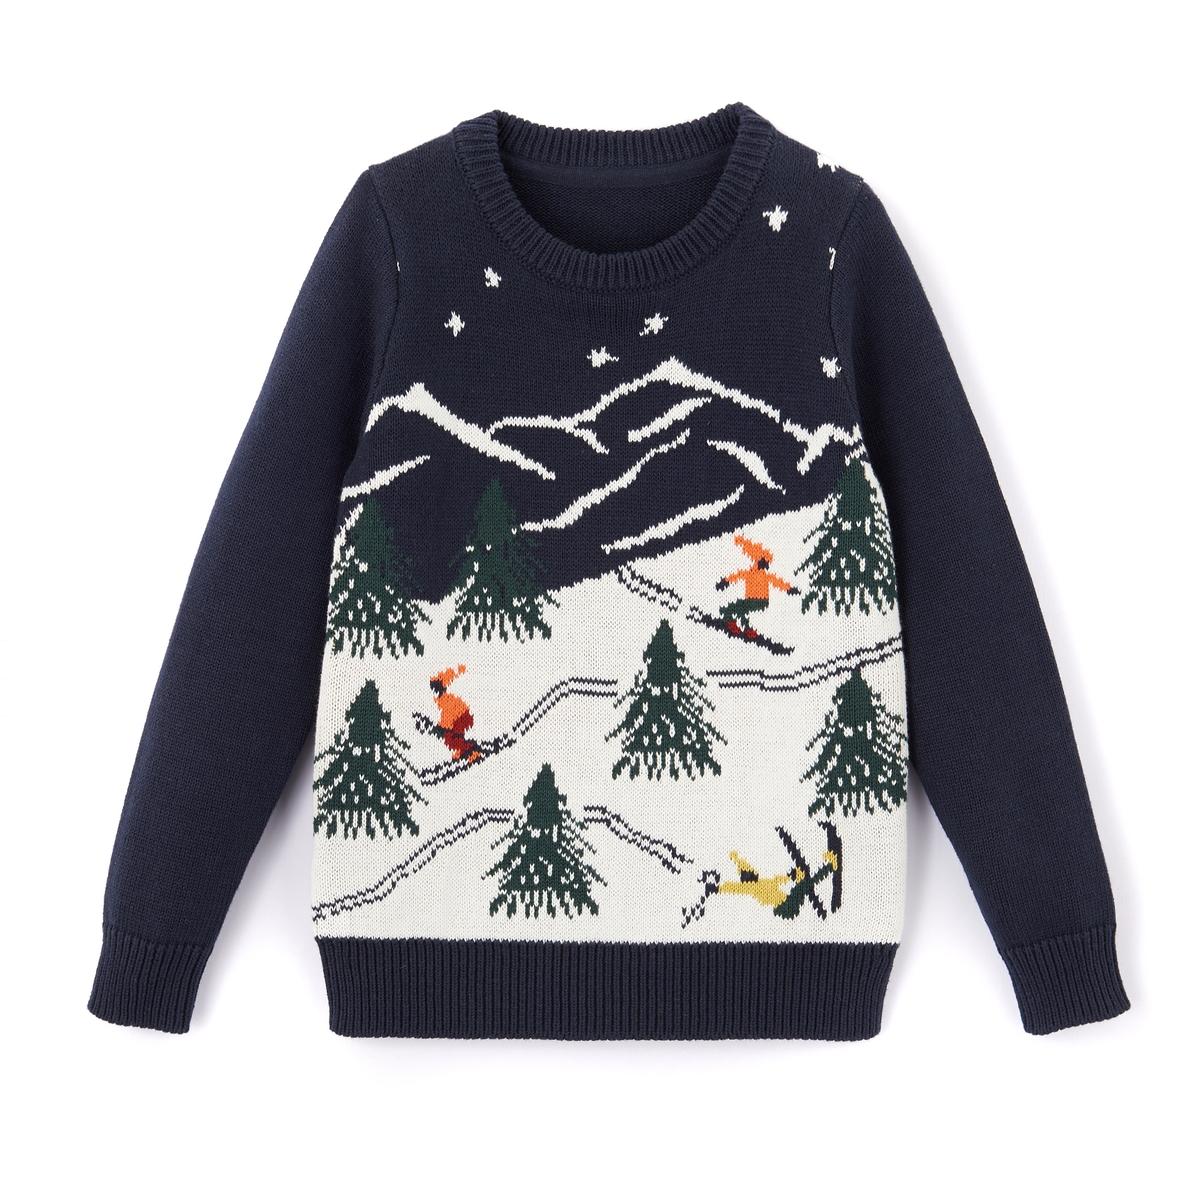 Пуловер 3-12 лет